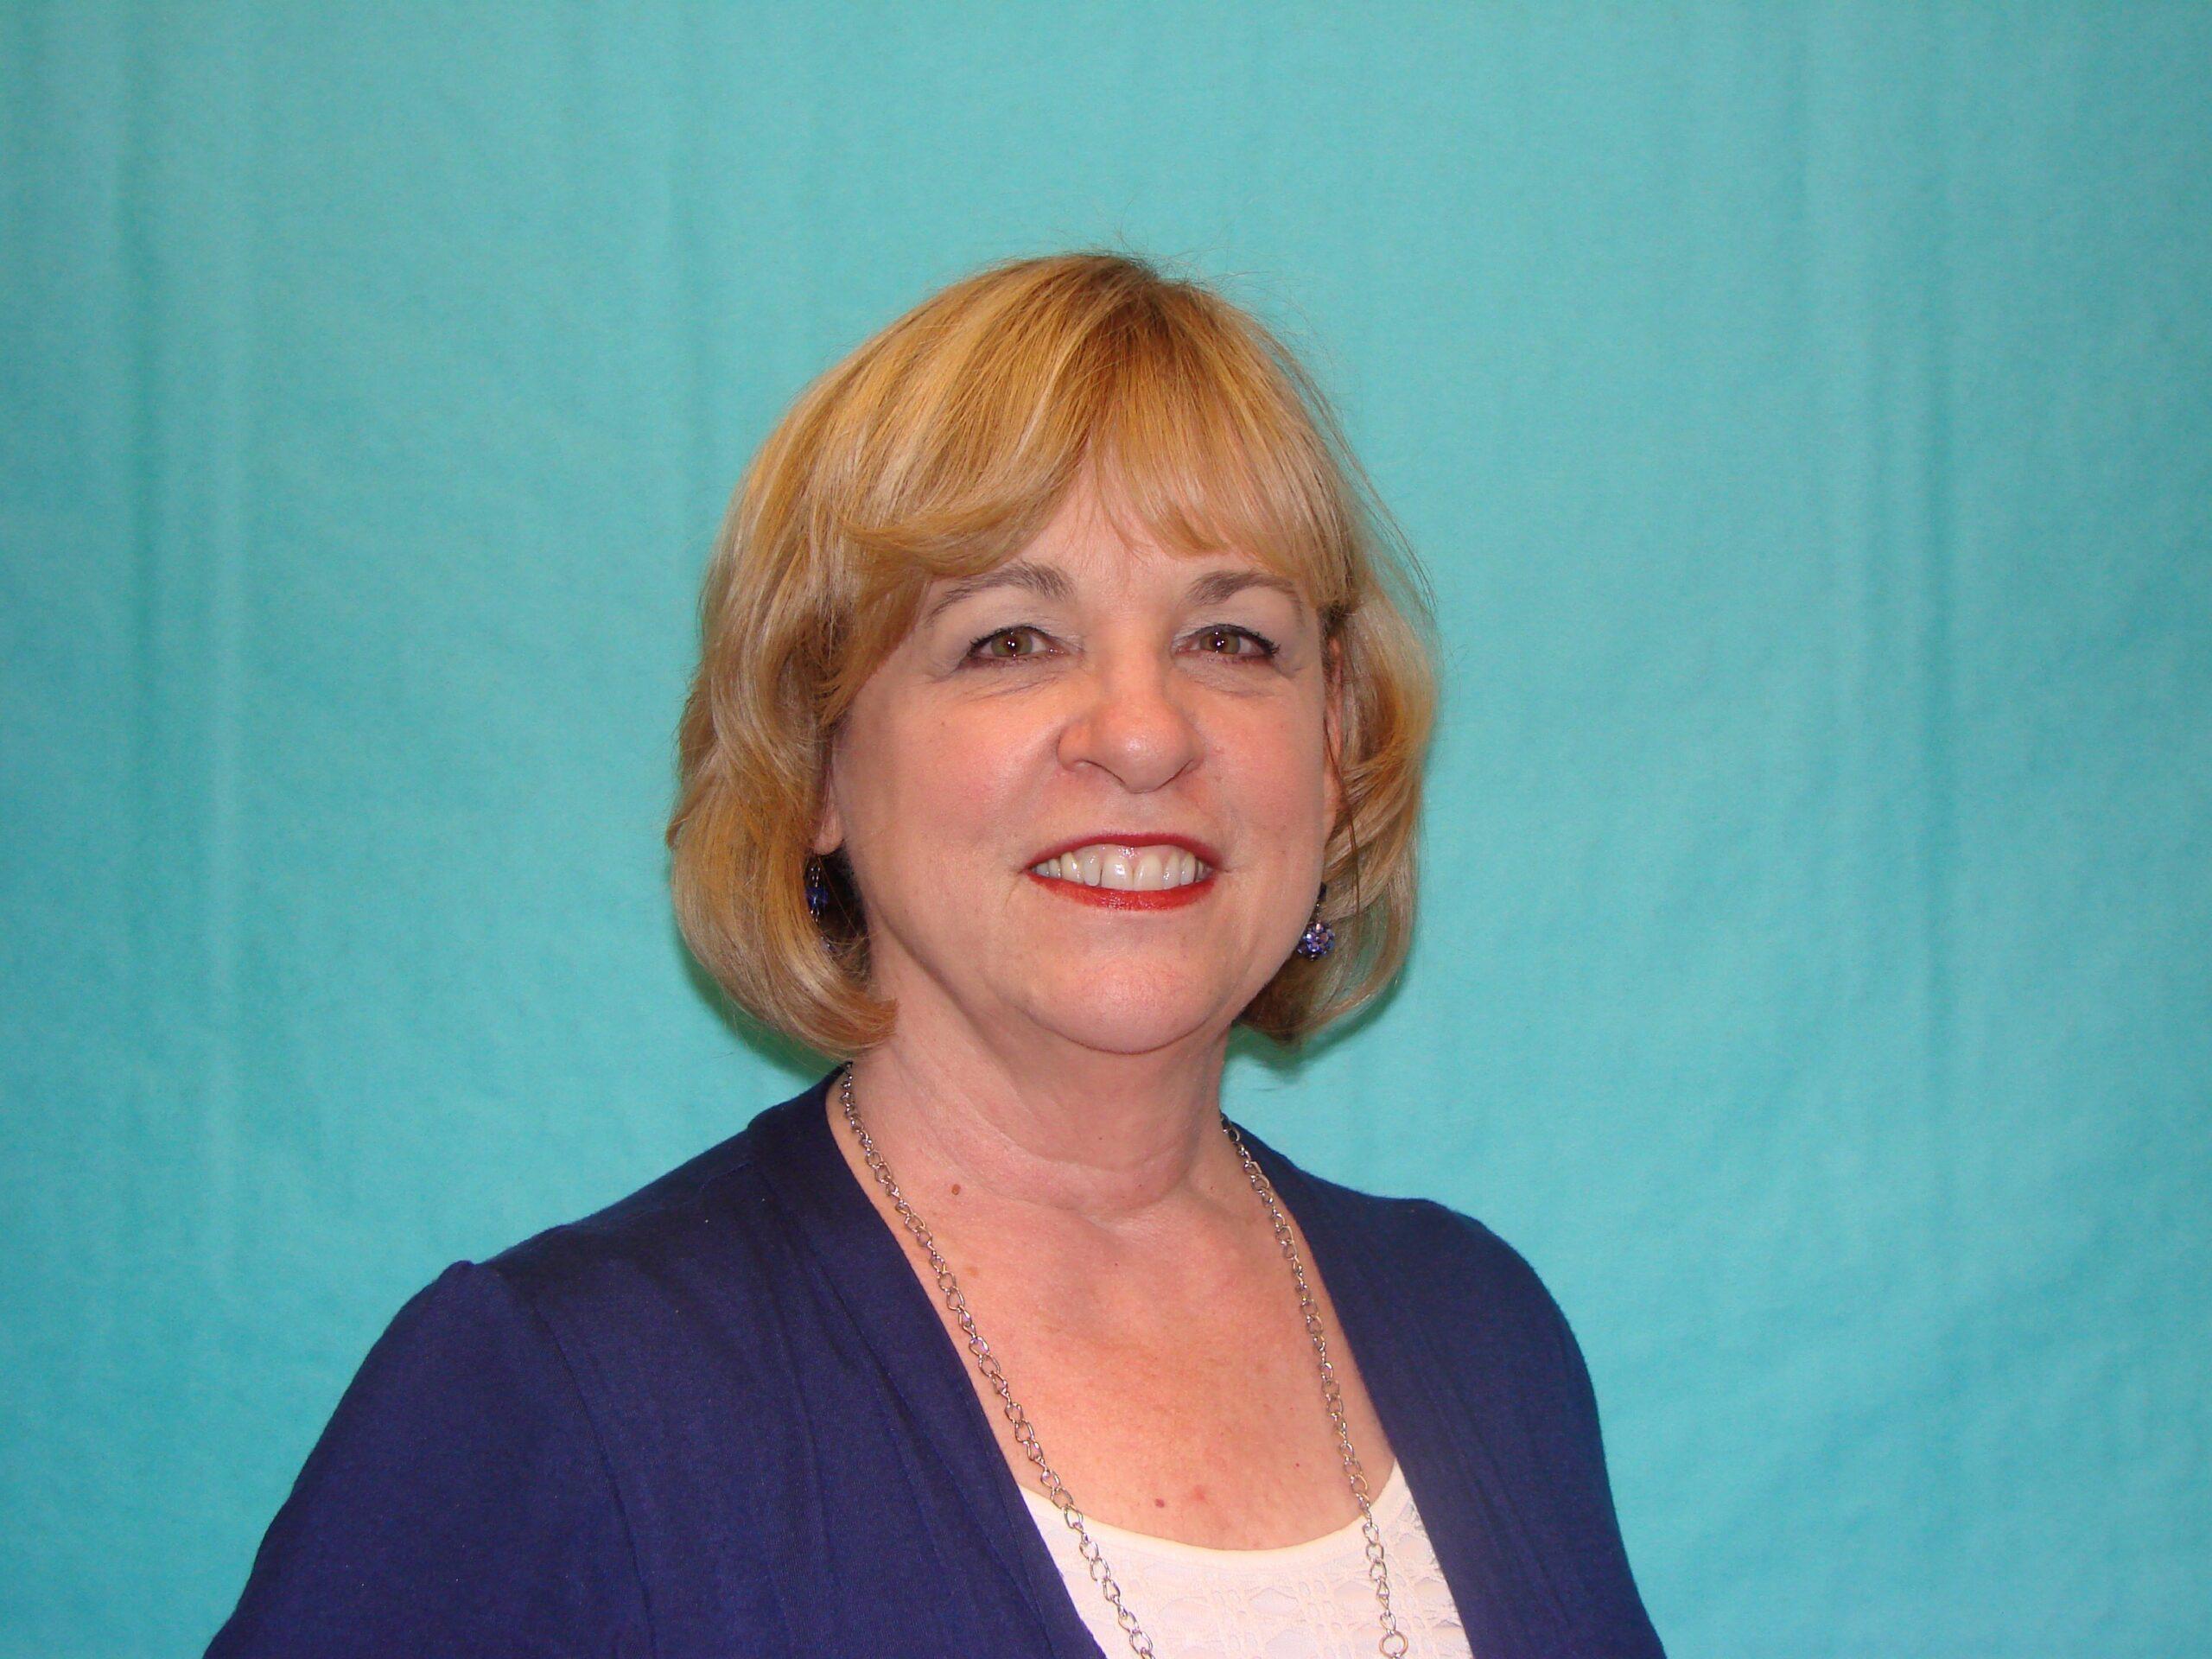 Profile image of Sonja Koukel